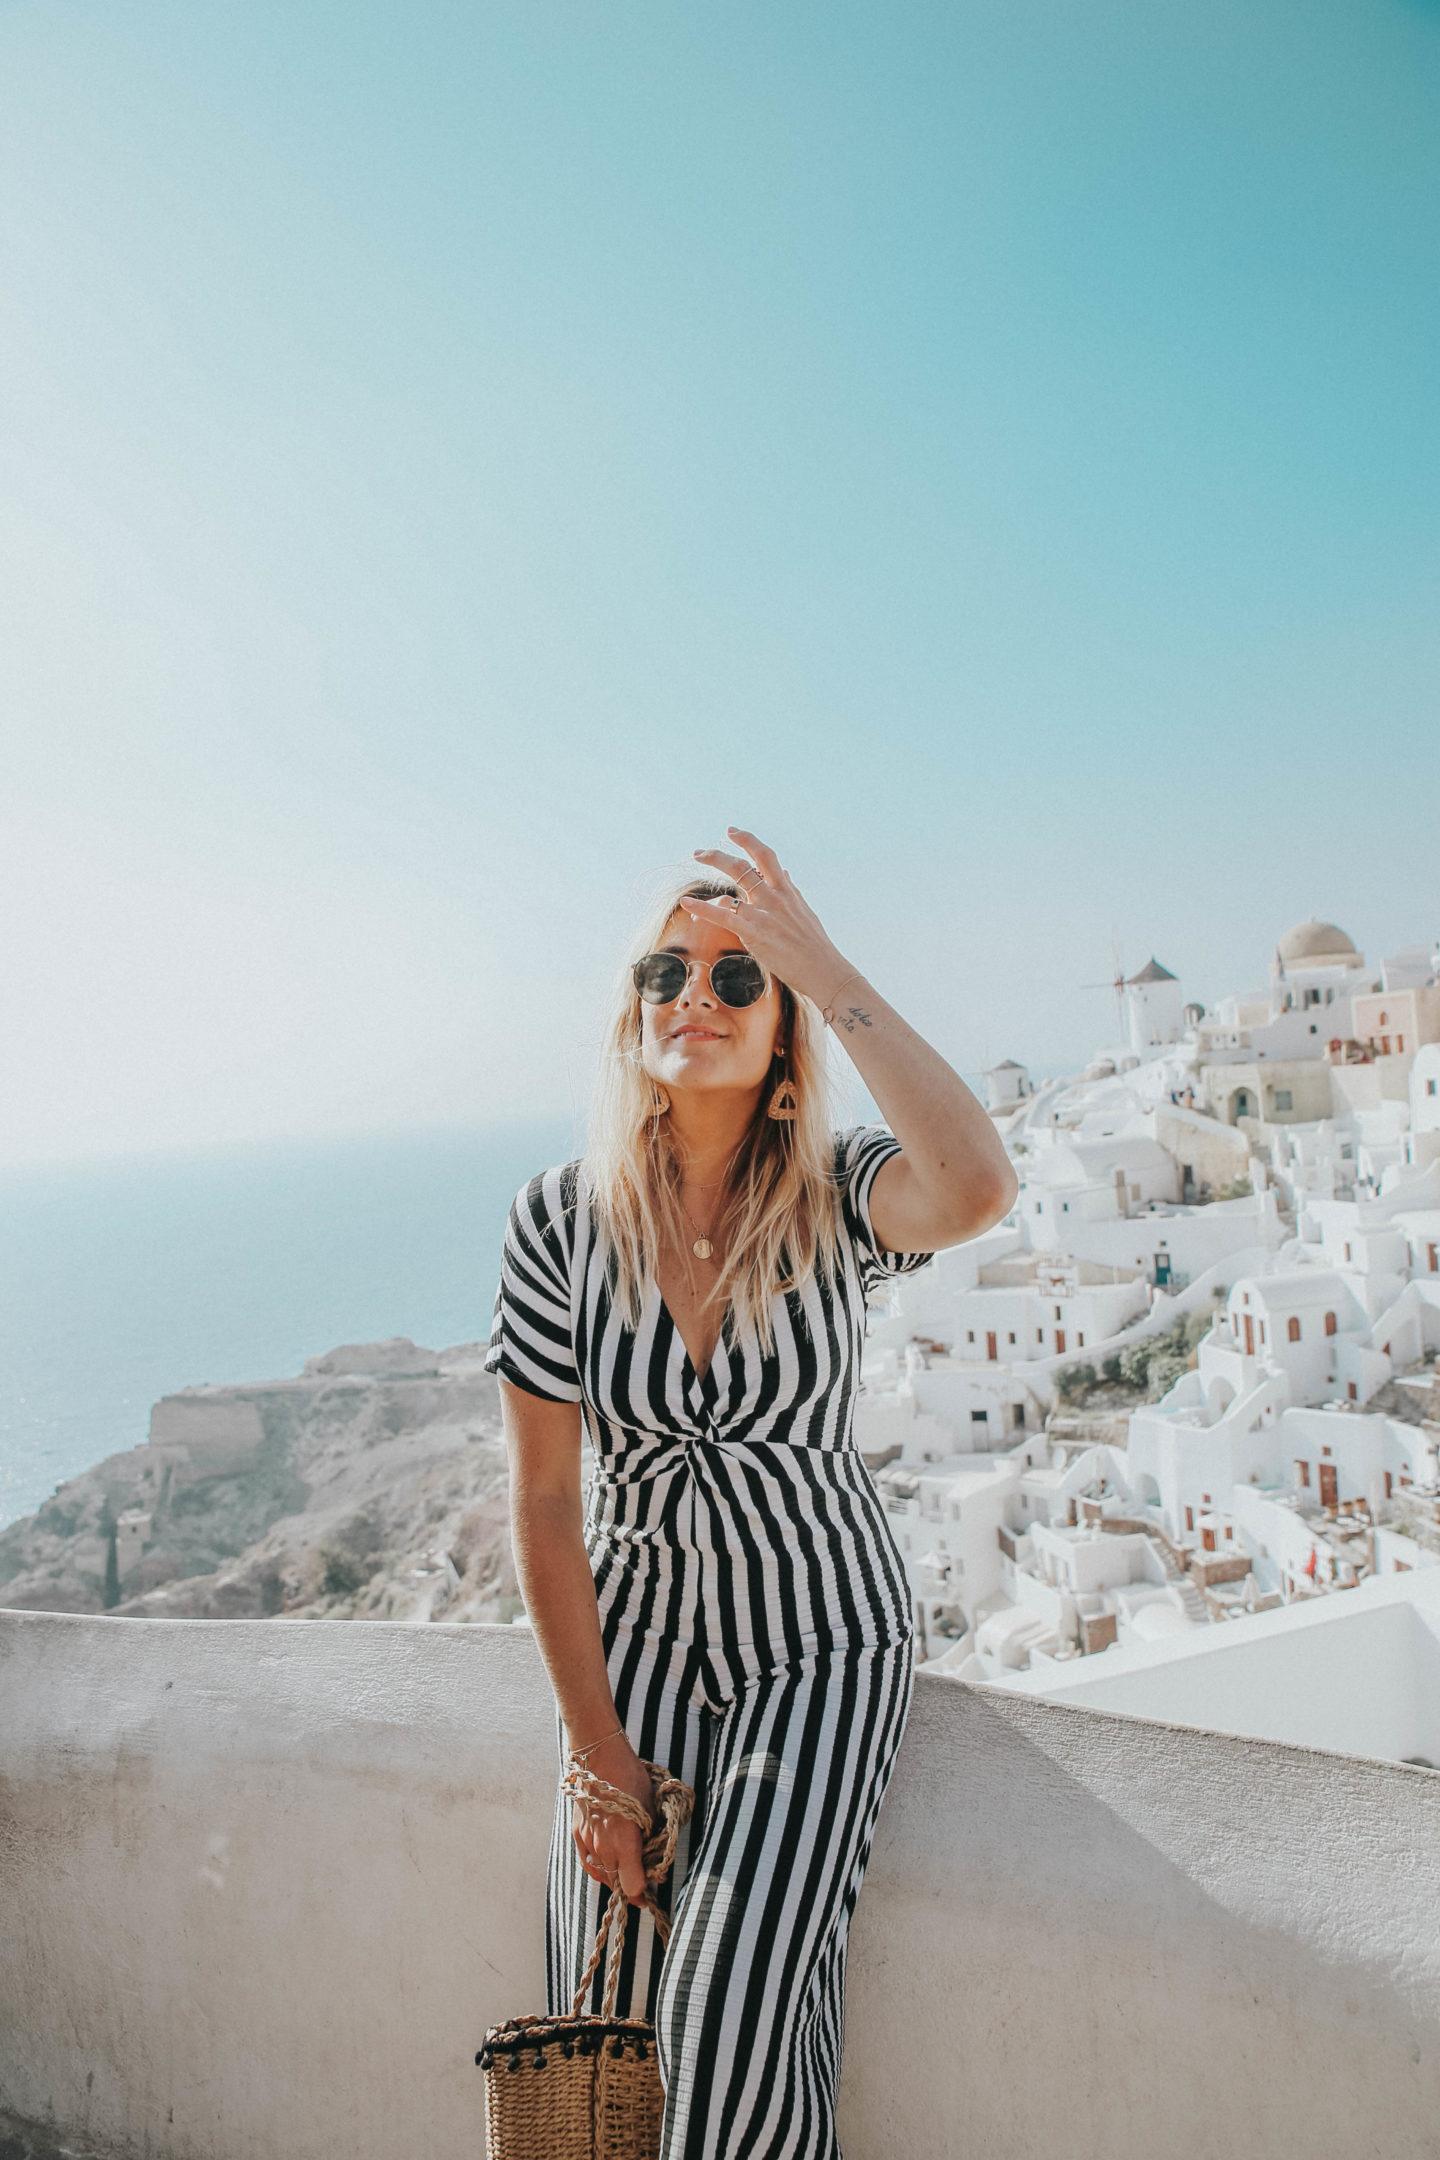 Combinaison Stradivarius - Blondie Baby blog mode et voyages